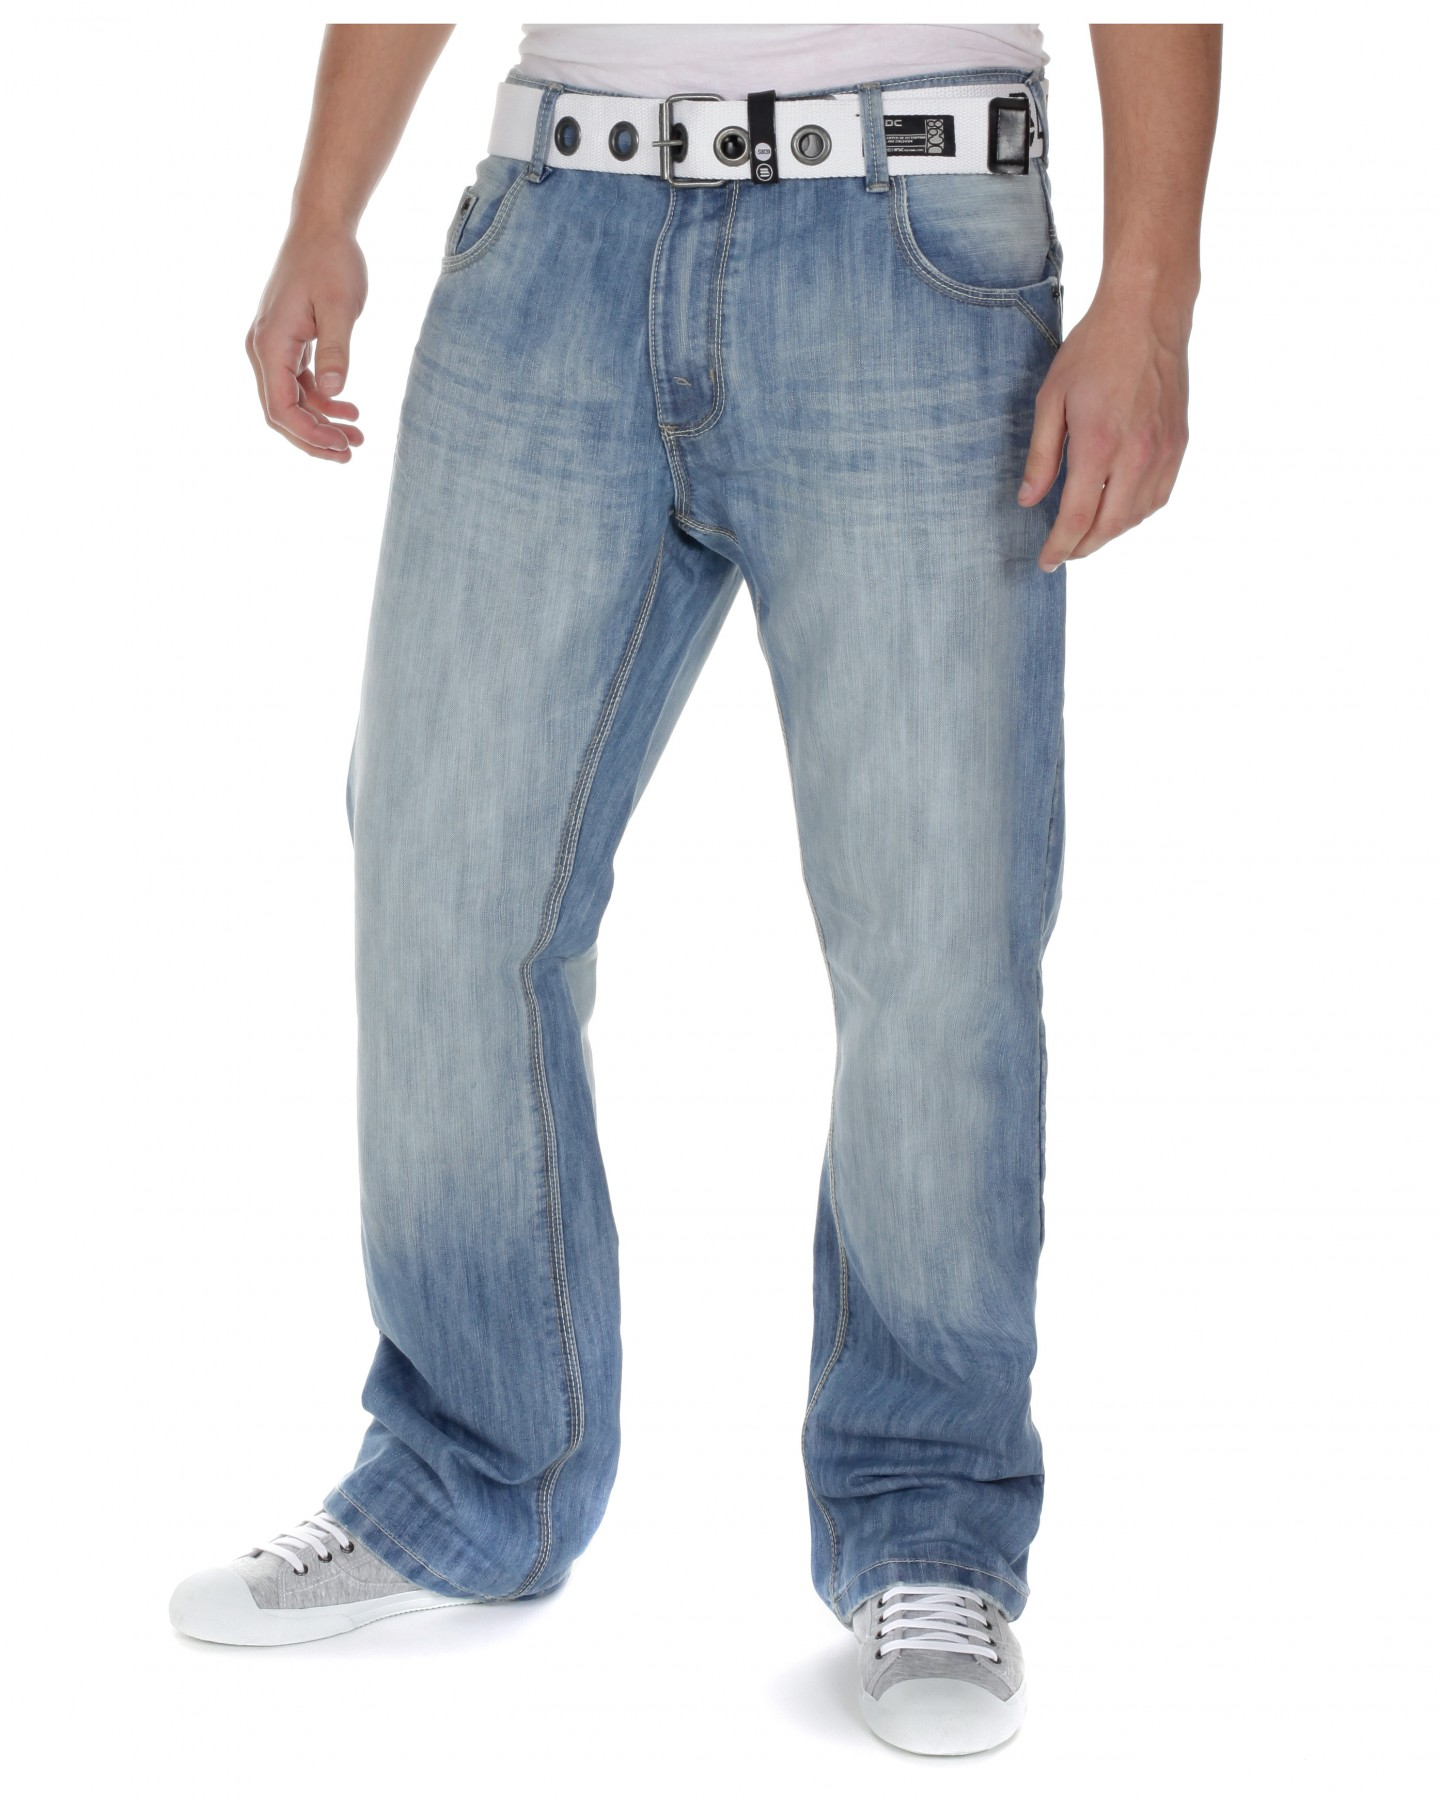 Light blue mens jeans - Jeans : Mince His Words